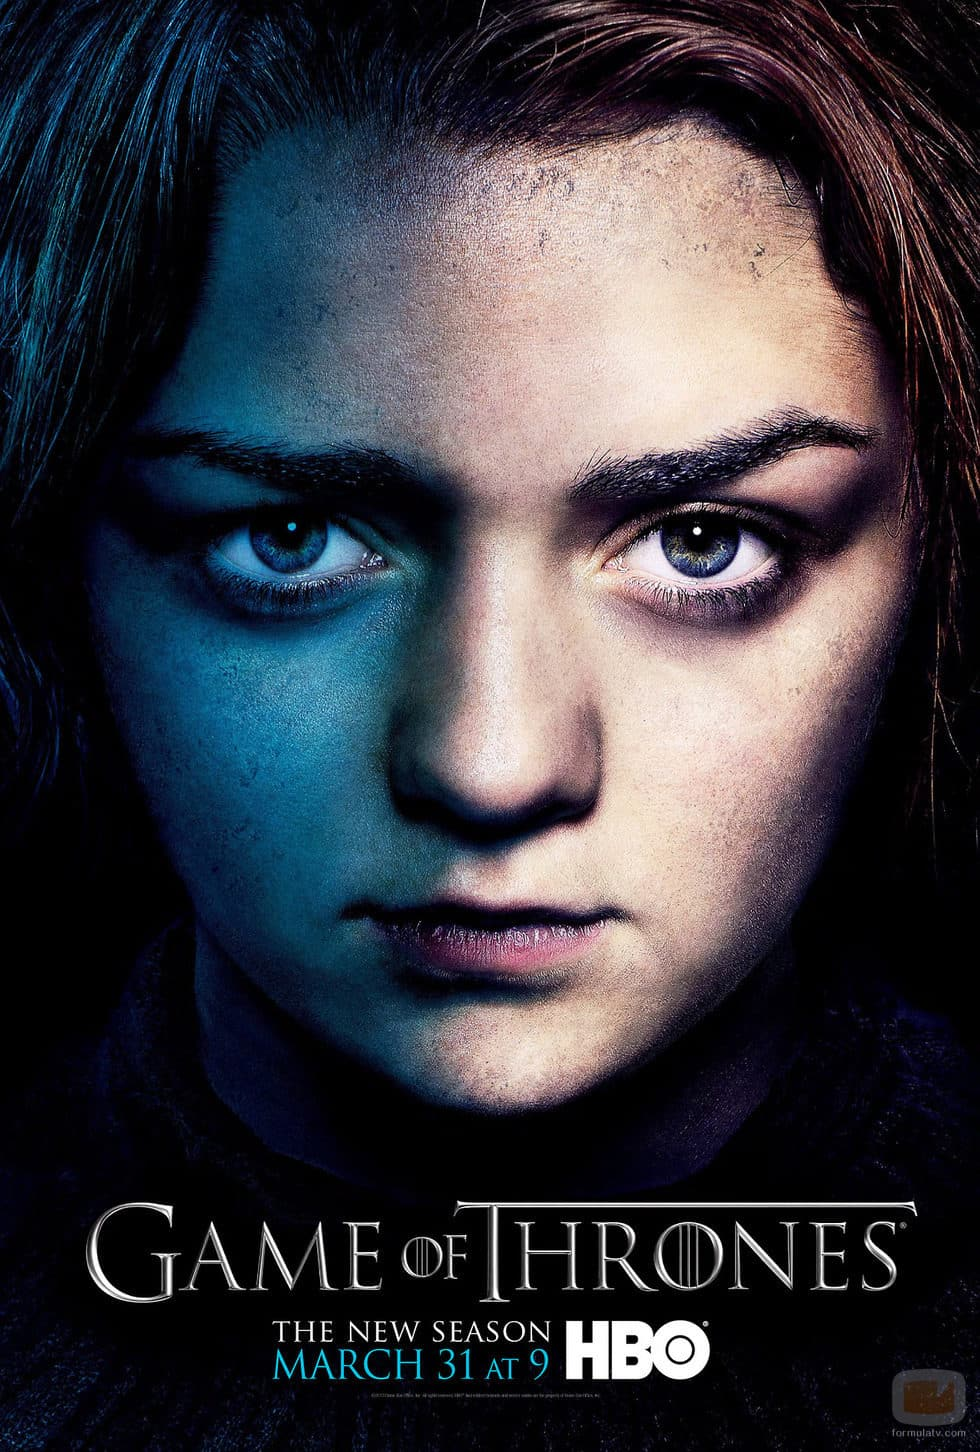 arya-stark-poster-promocional-tercera-temporada-juego-de-tronos